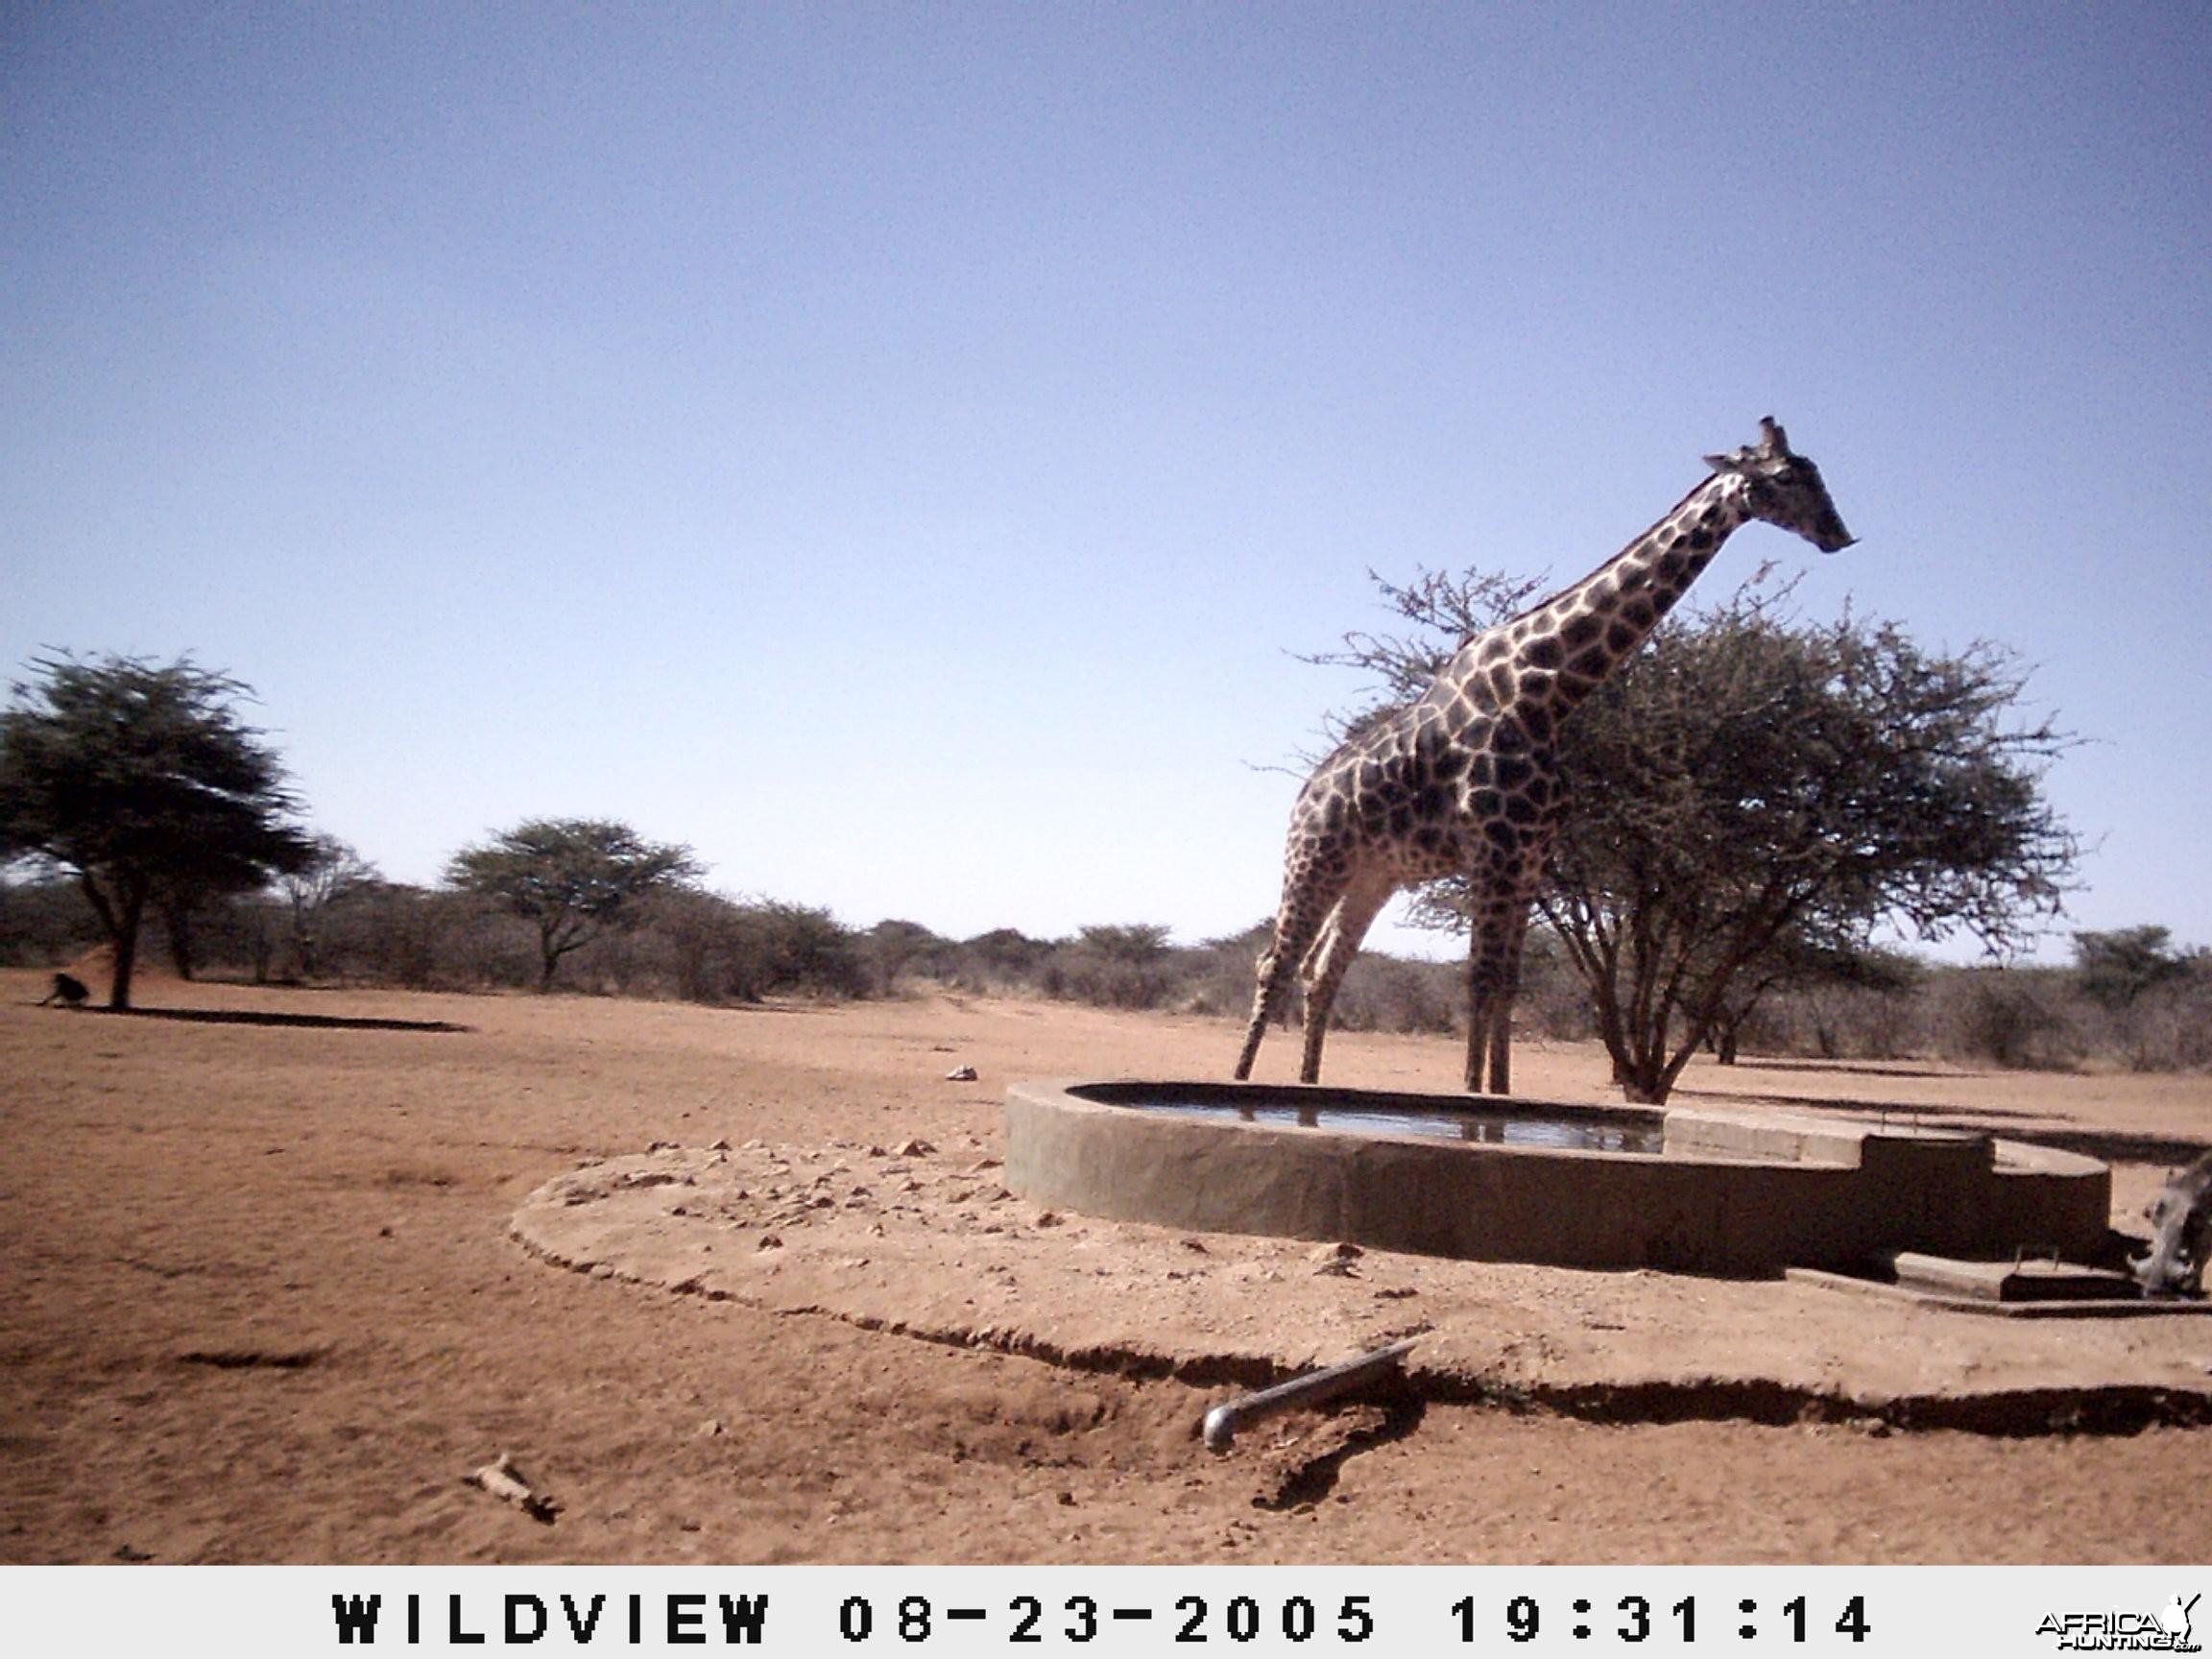 Giraffes, Warthog and Baboon, Namibia